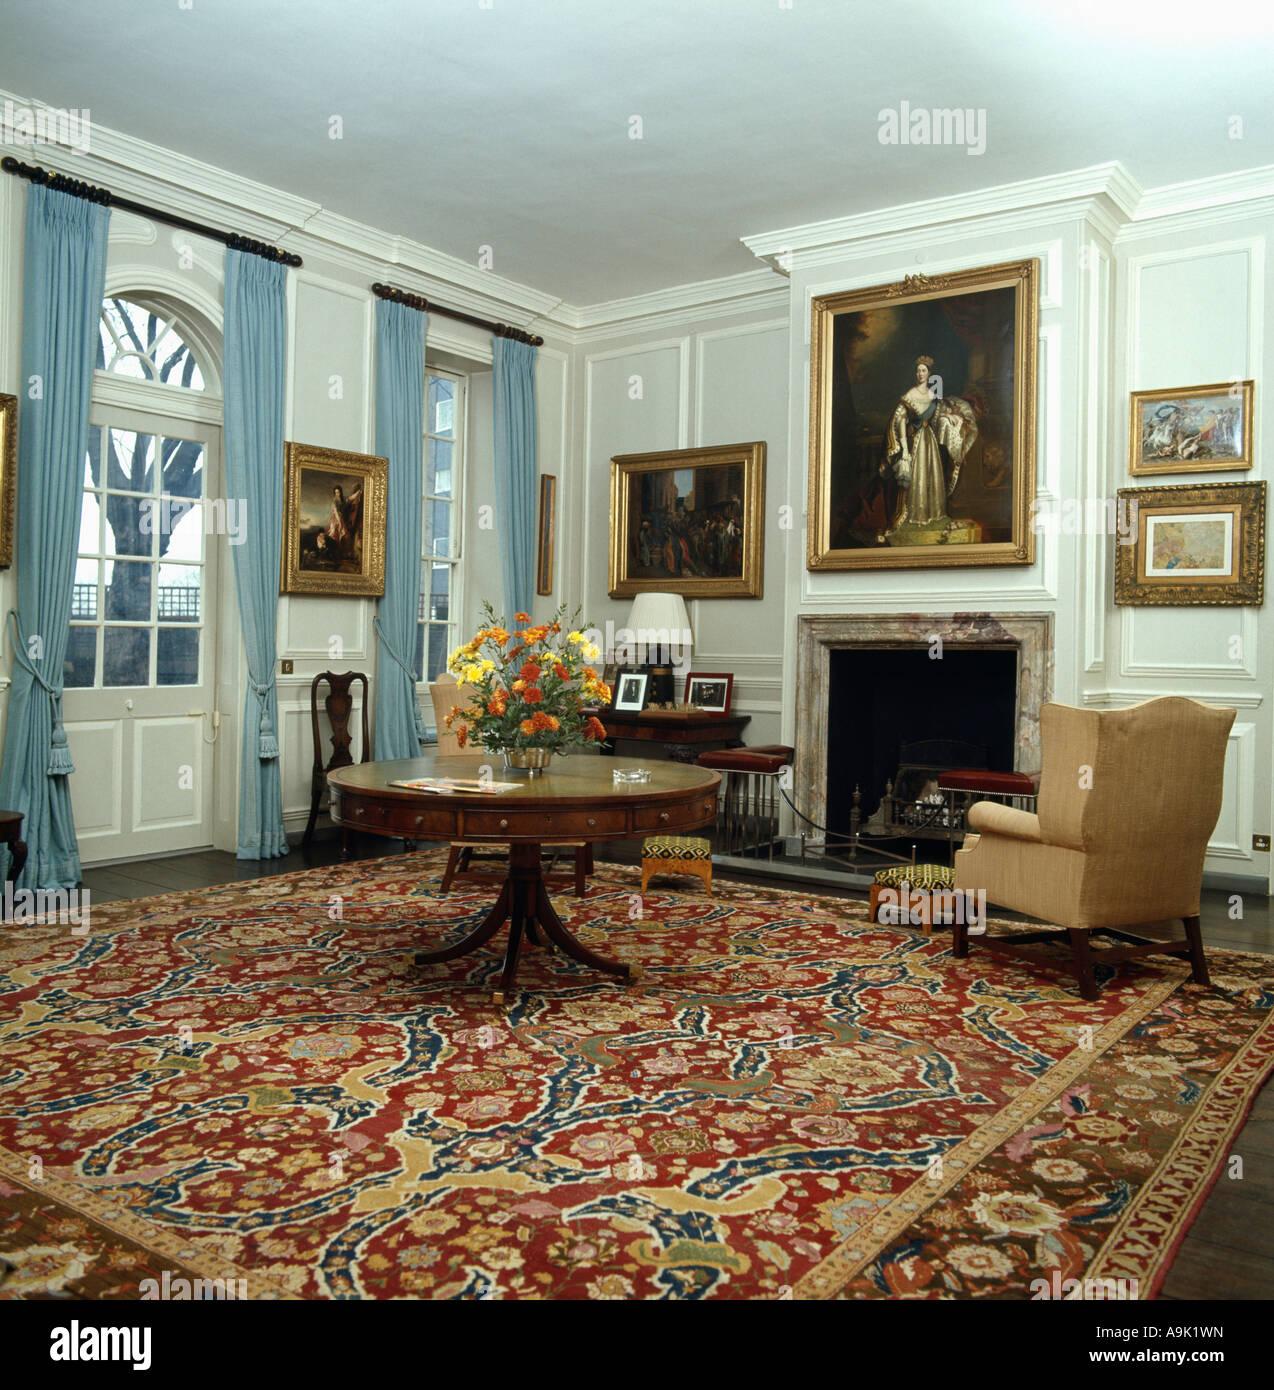 blauer runder teppich good petrol teppich grun blau braun. Black Bedroom Furniture Sets. Home Design Ideas